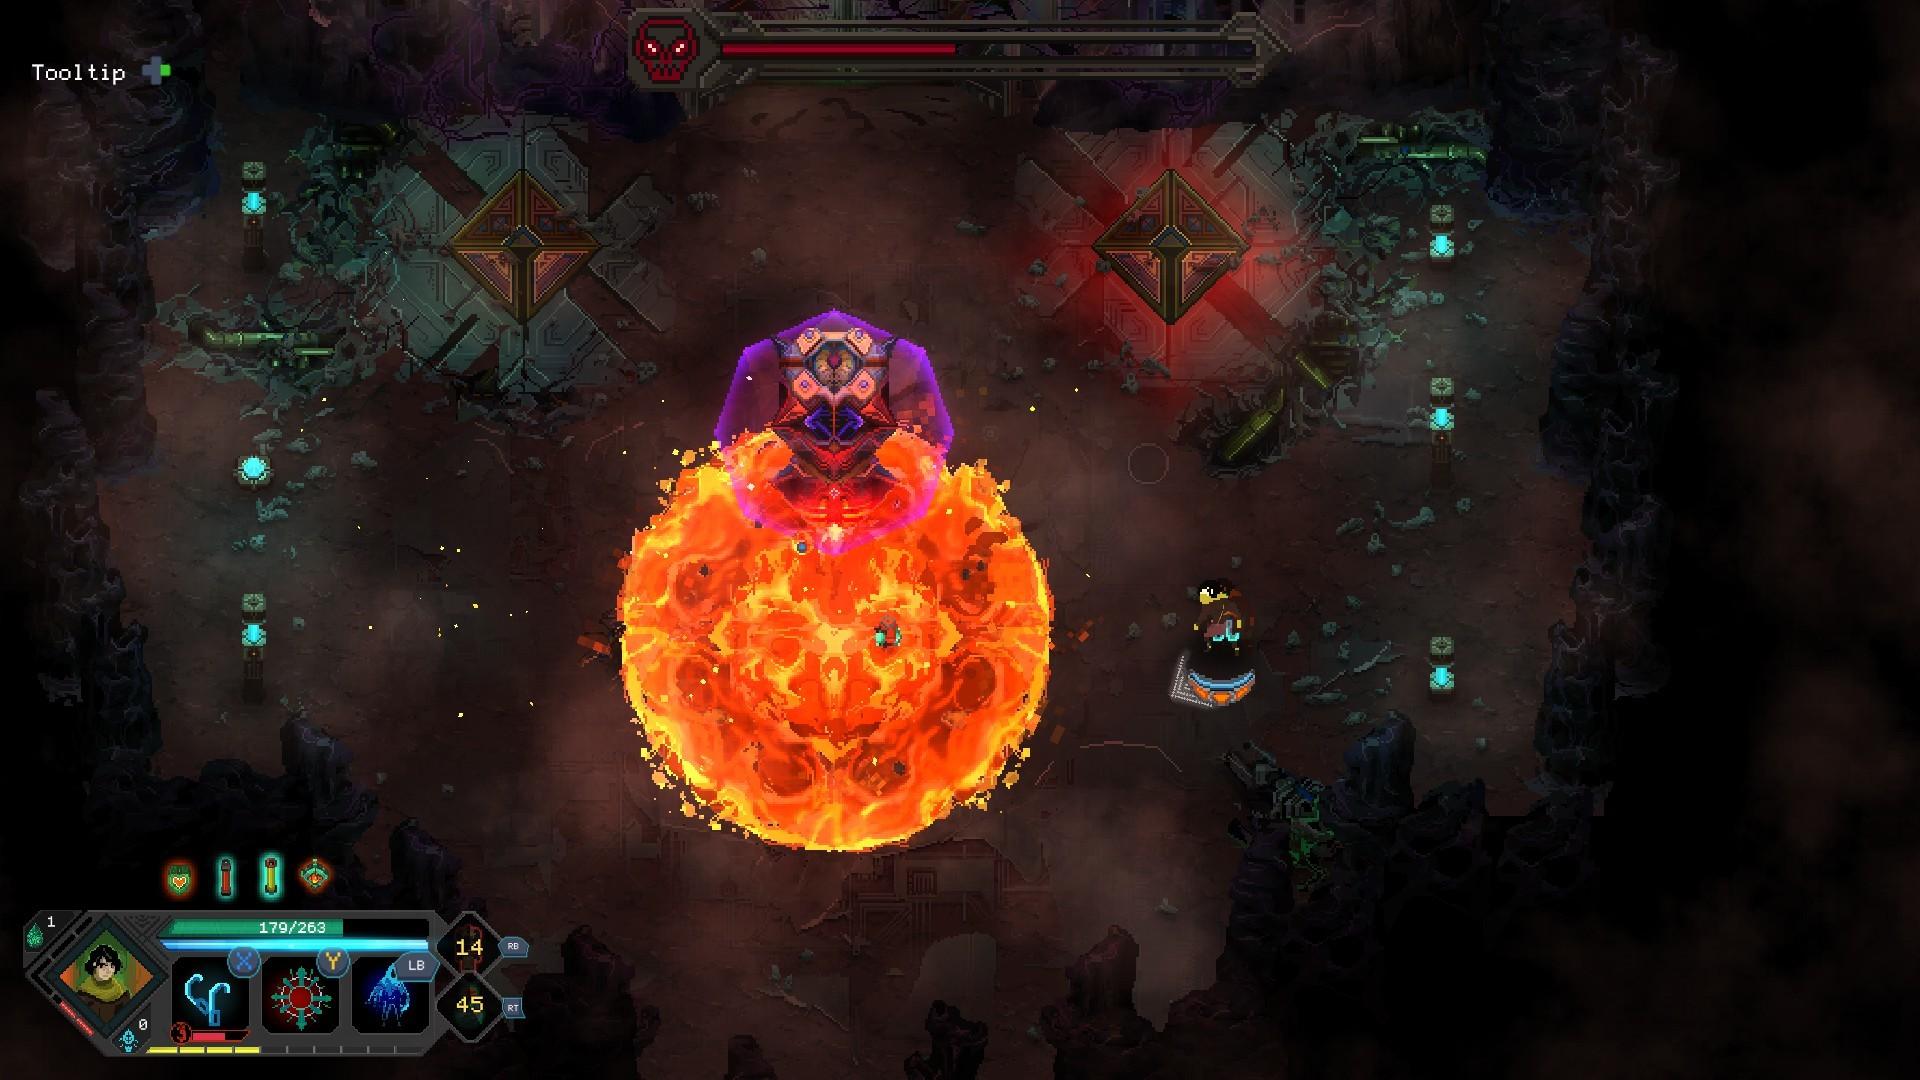 The best games like Diablo: Children of Morta